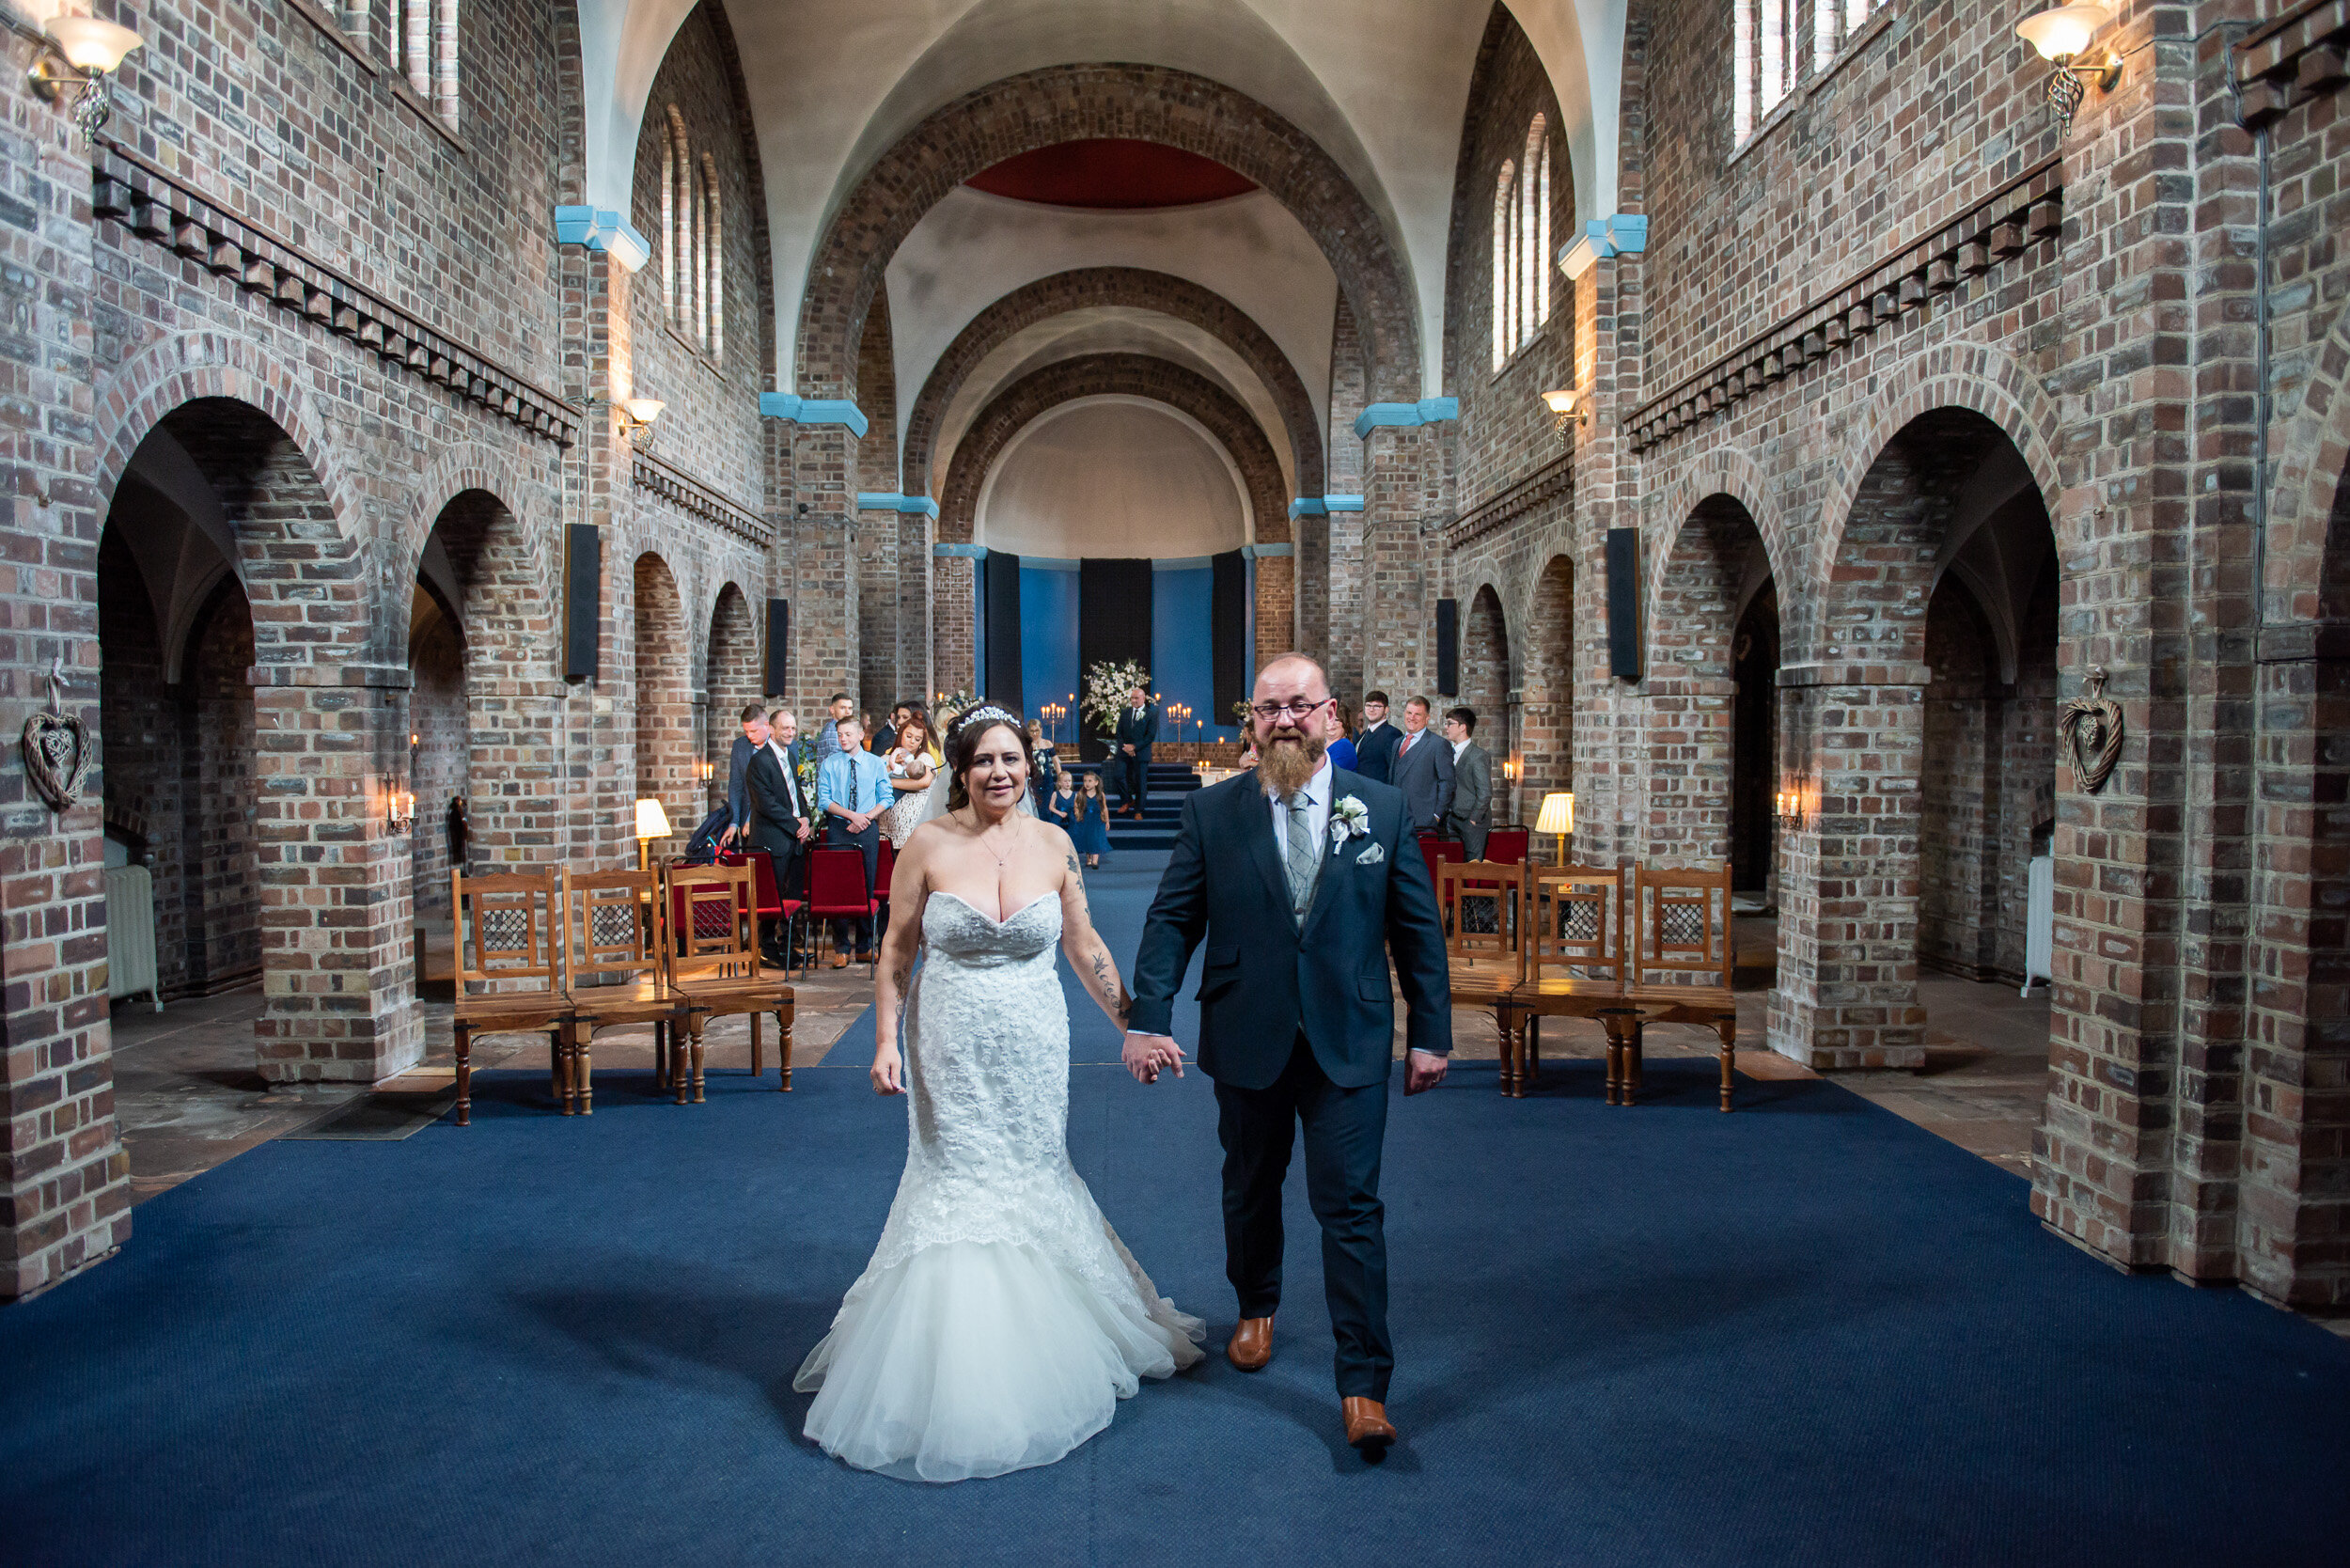 Heaton_wedding_photos_Gretna-6.jpg